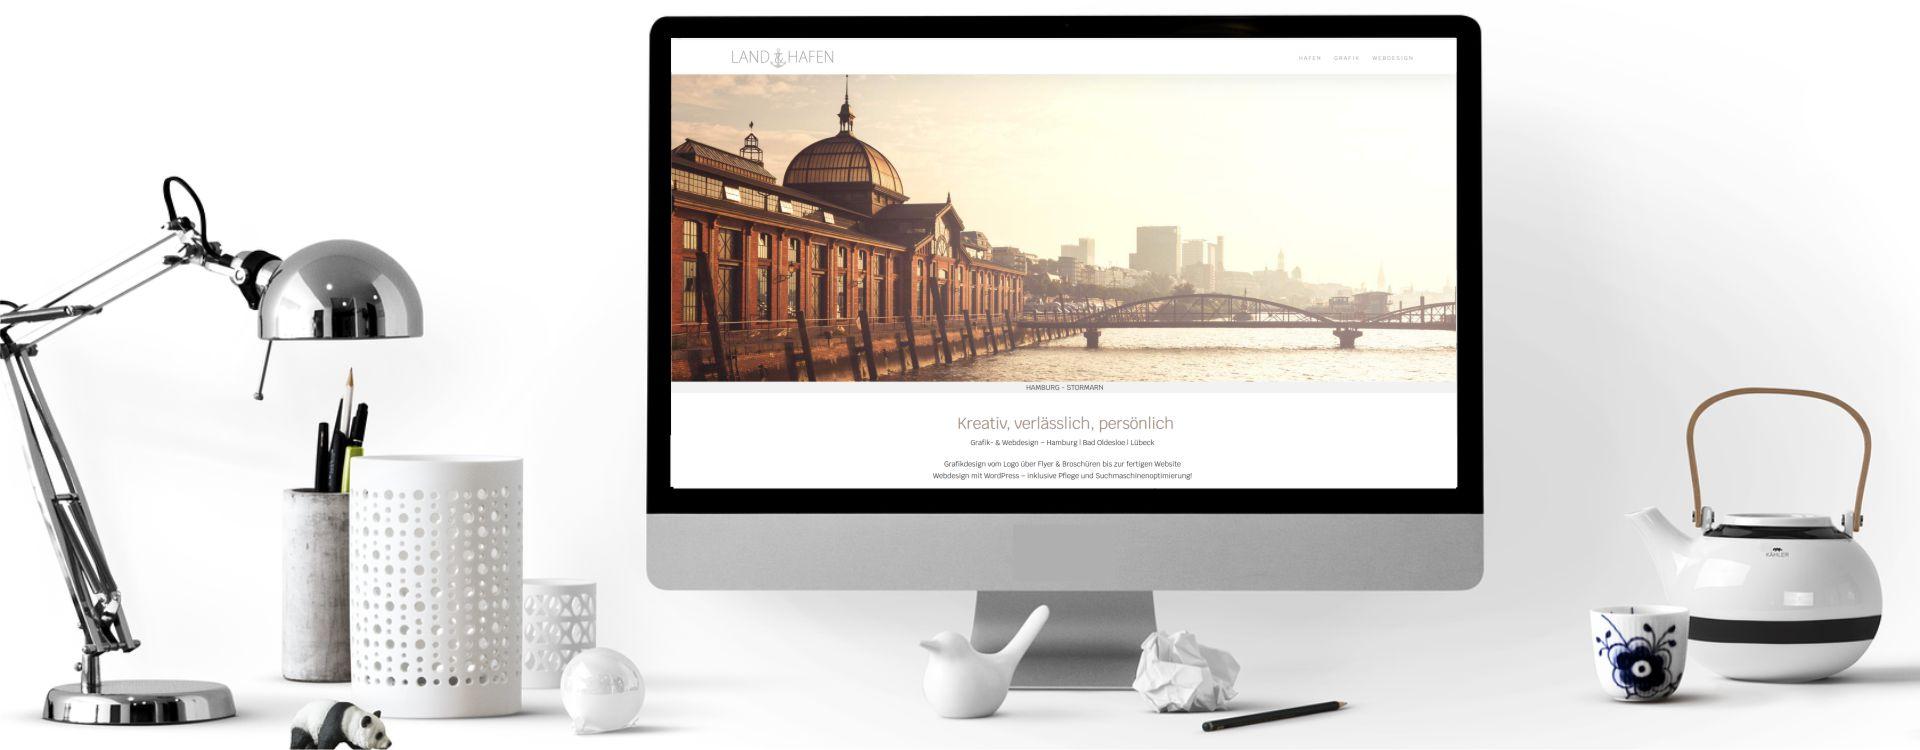 Responsive Webdesign | Grafik Studio Land & Hafen